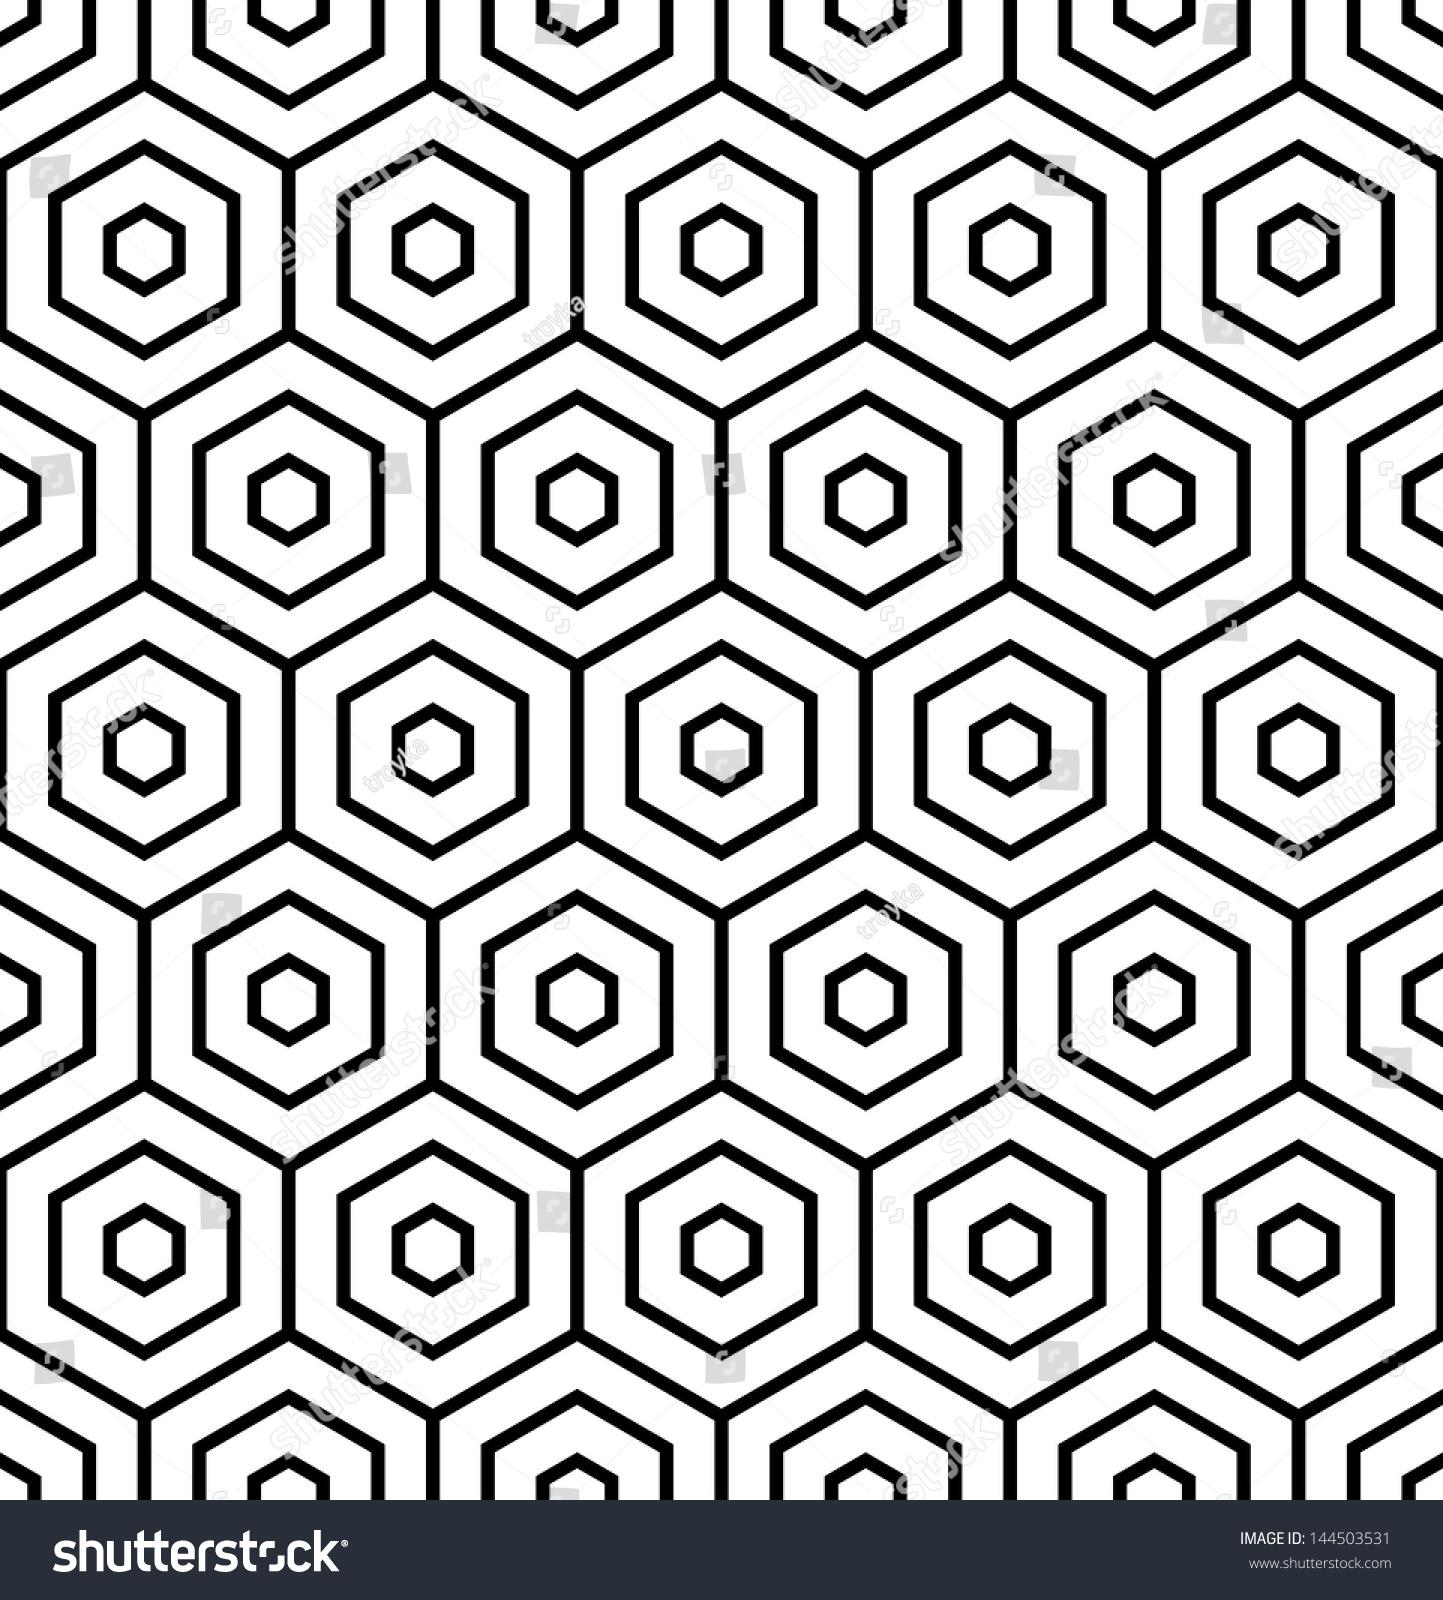 Hexagons Texture Seamless Geometric Pattern Vector Stock Vector ...